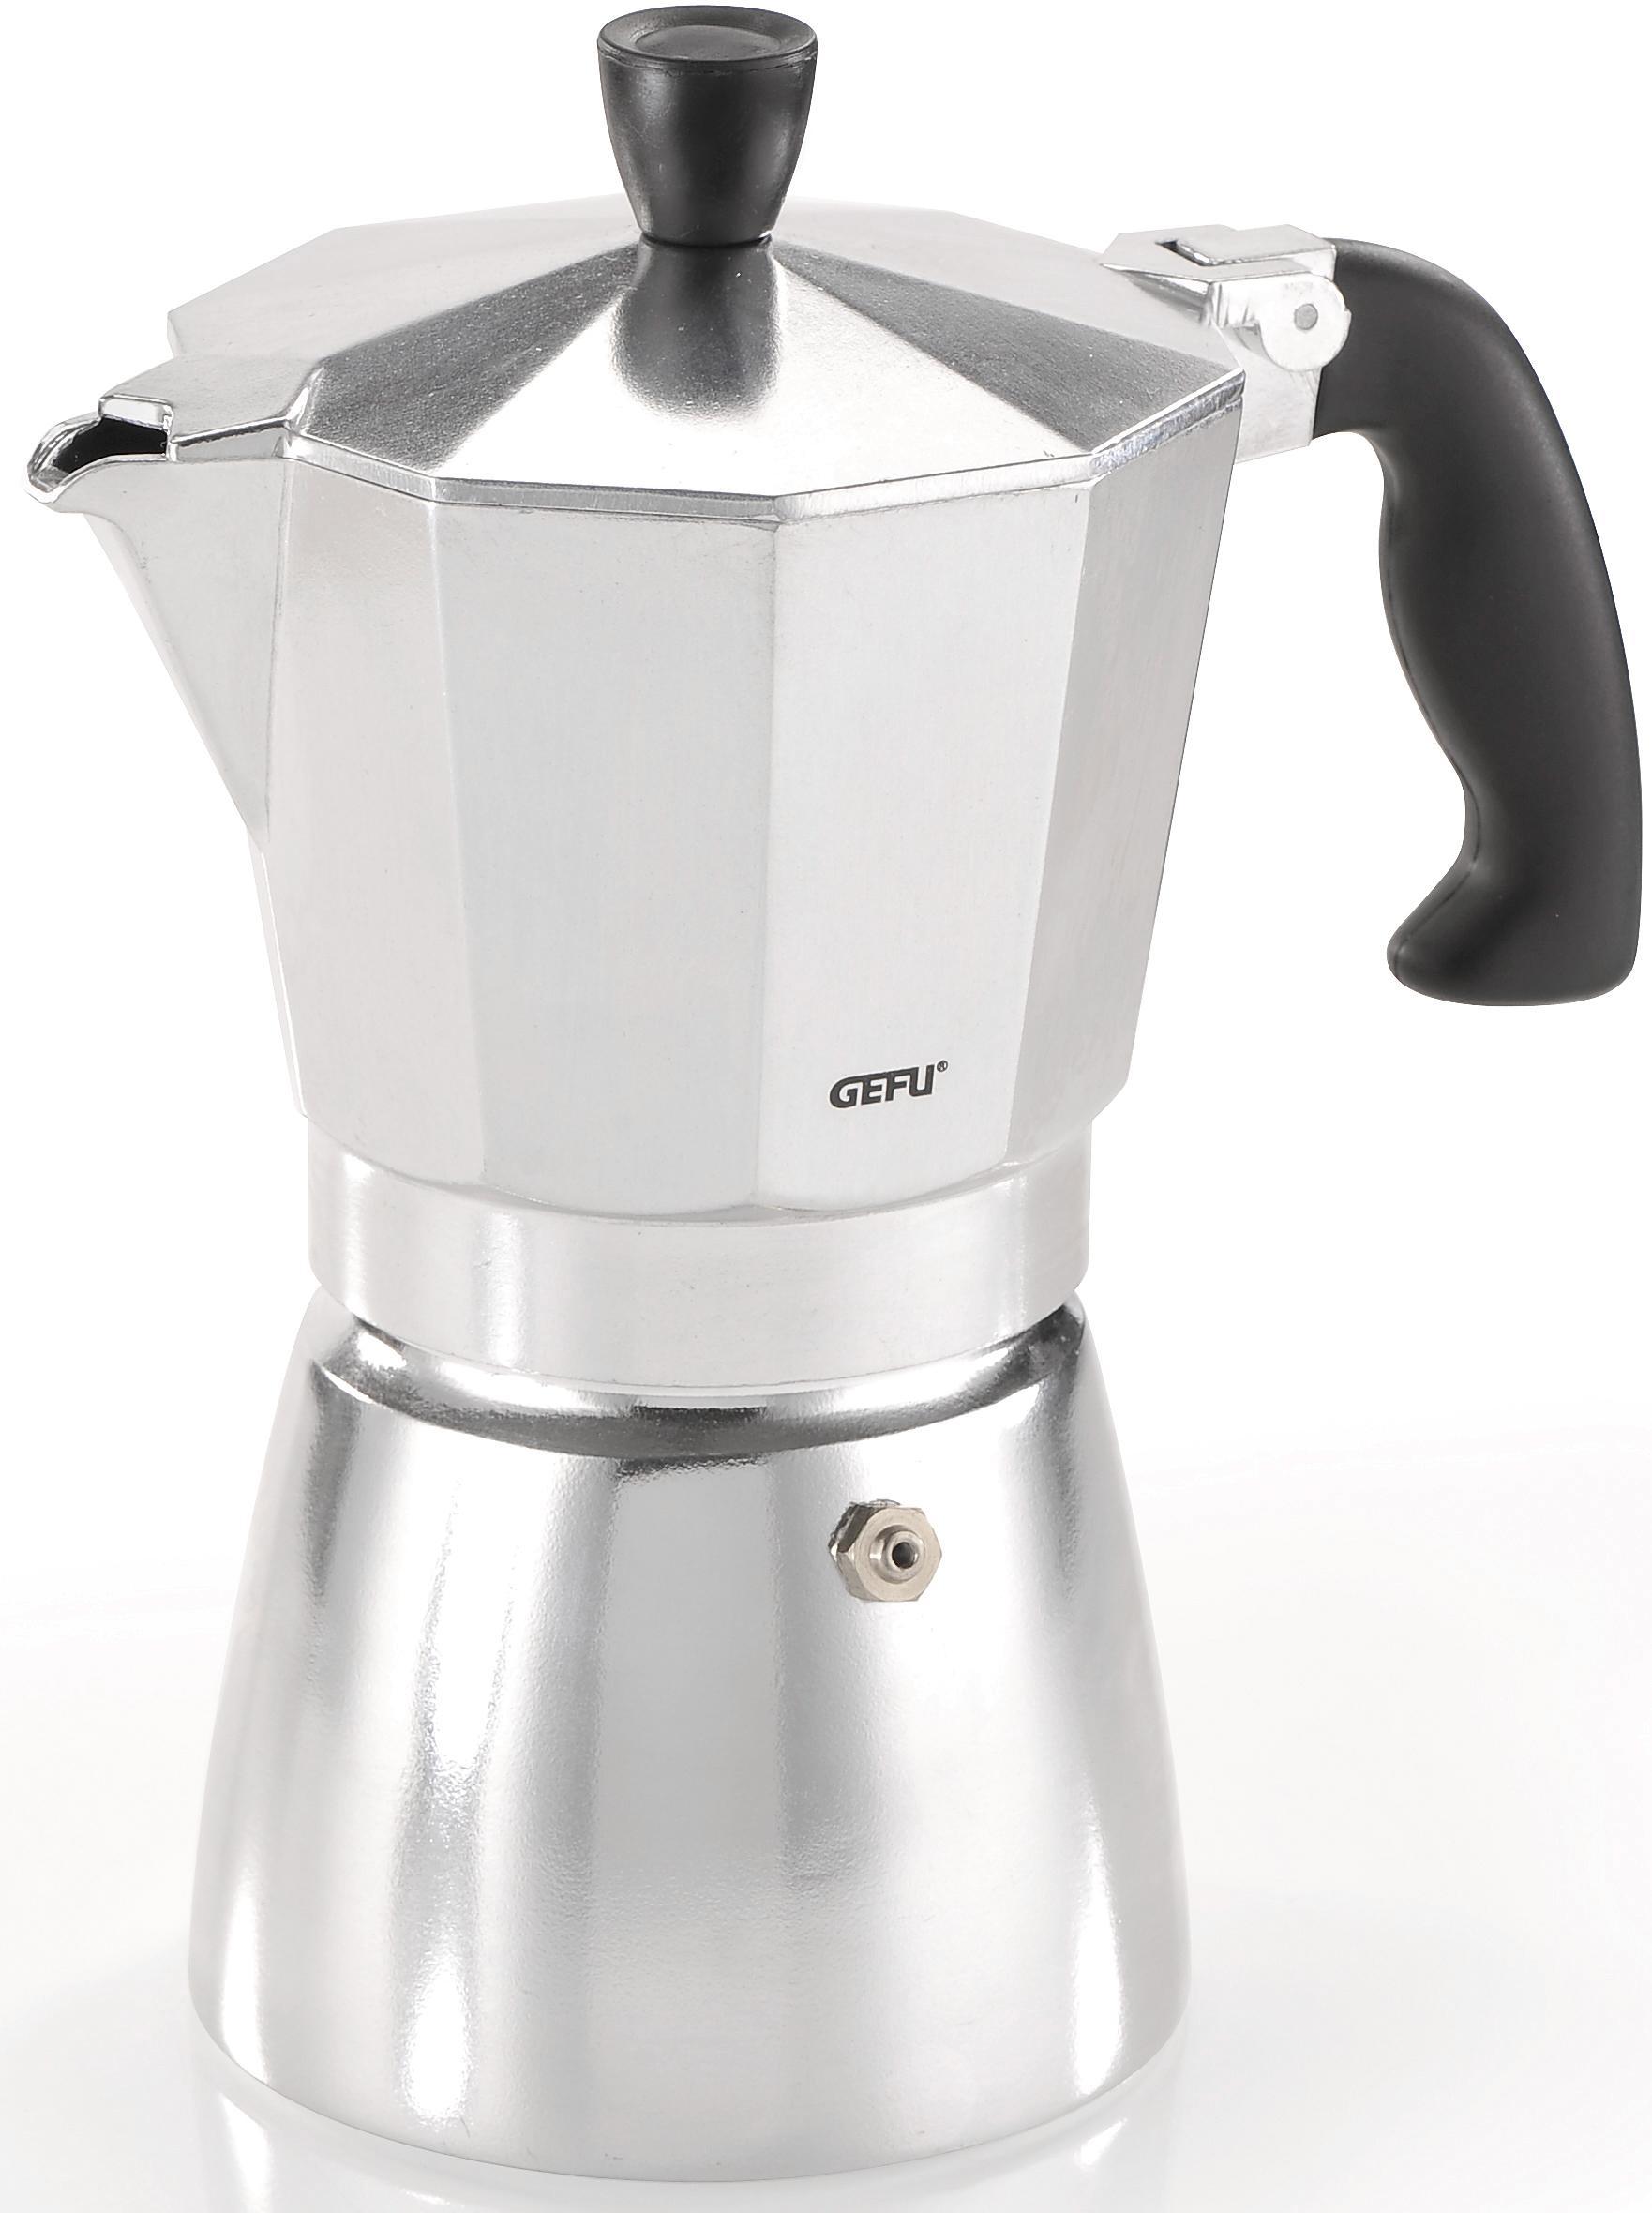 GEFU Espressokocher Lucino